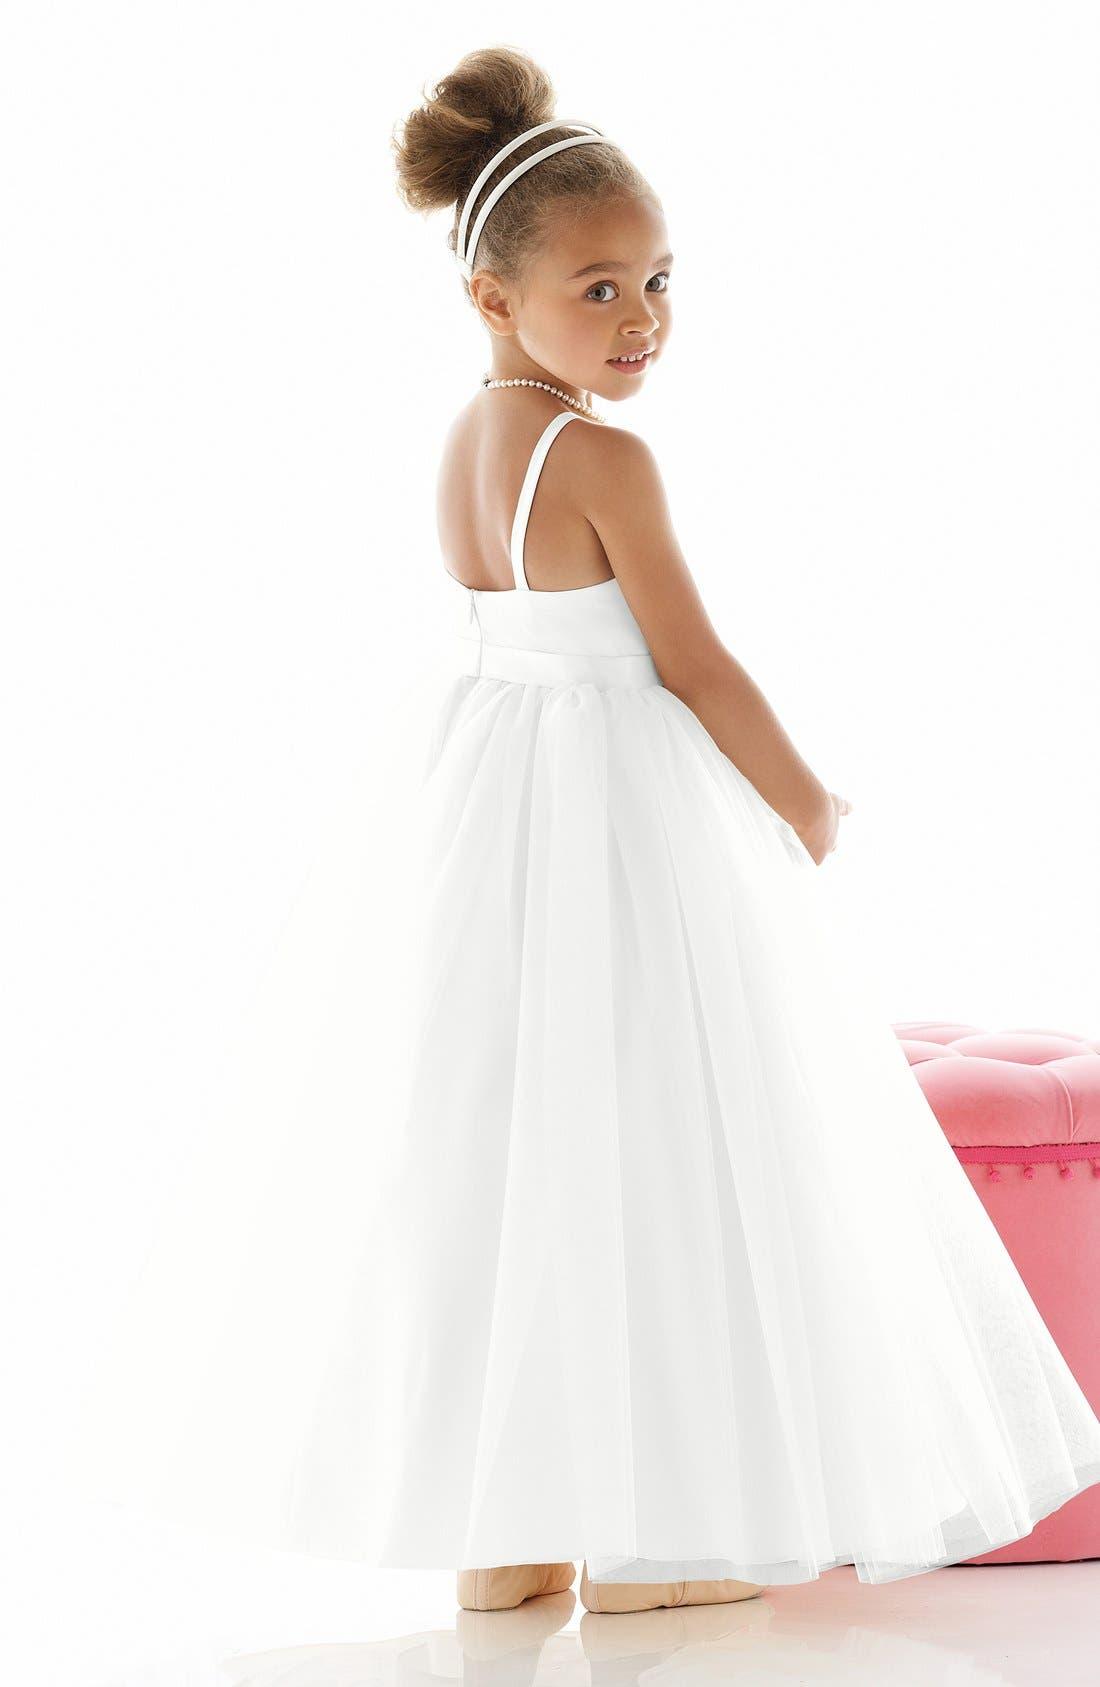 Alternate Image 2  - Dessy Collection 'Rose' Satin & Tulle Flower Girl Dress (Toddler, Little Girls & Big Girls)